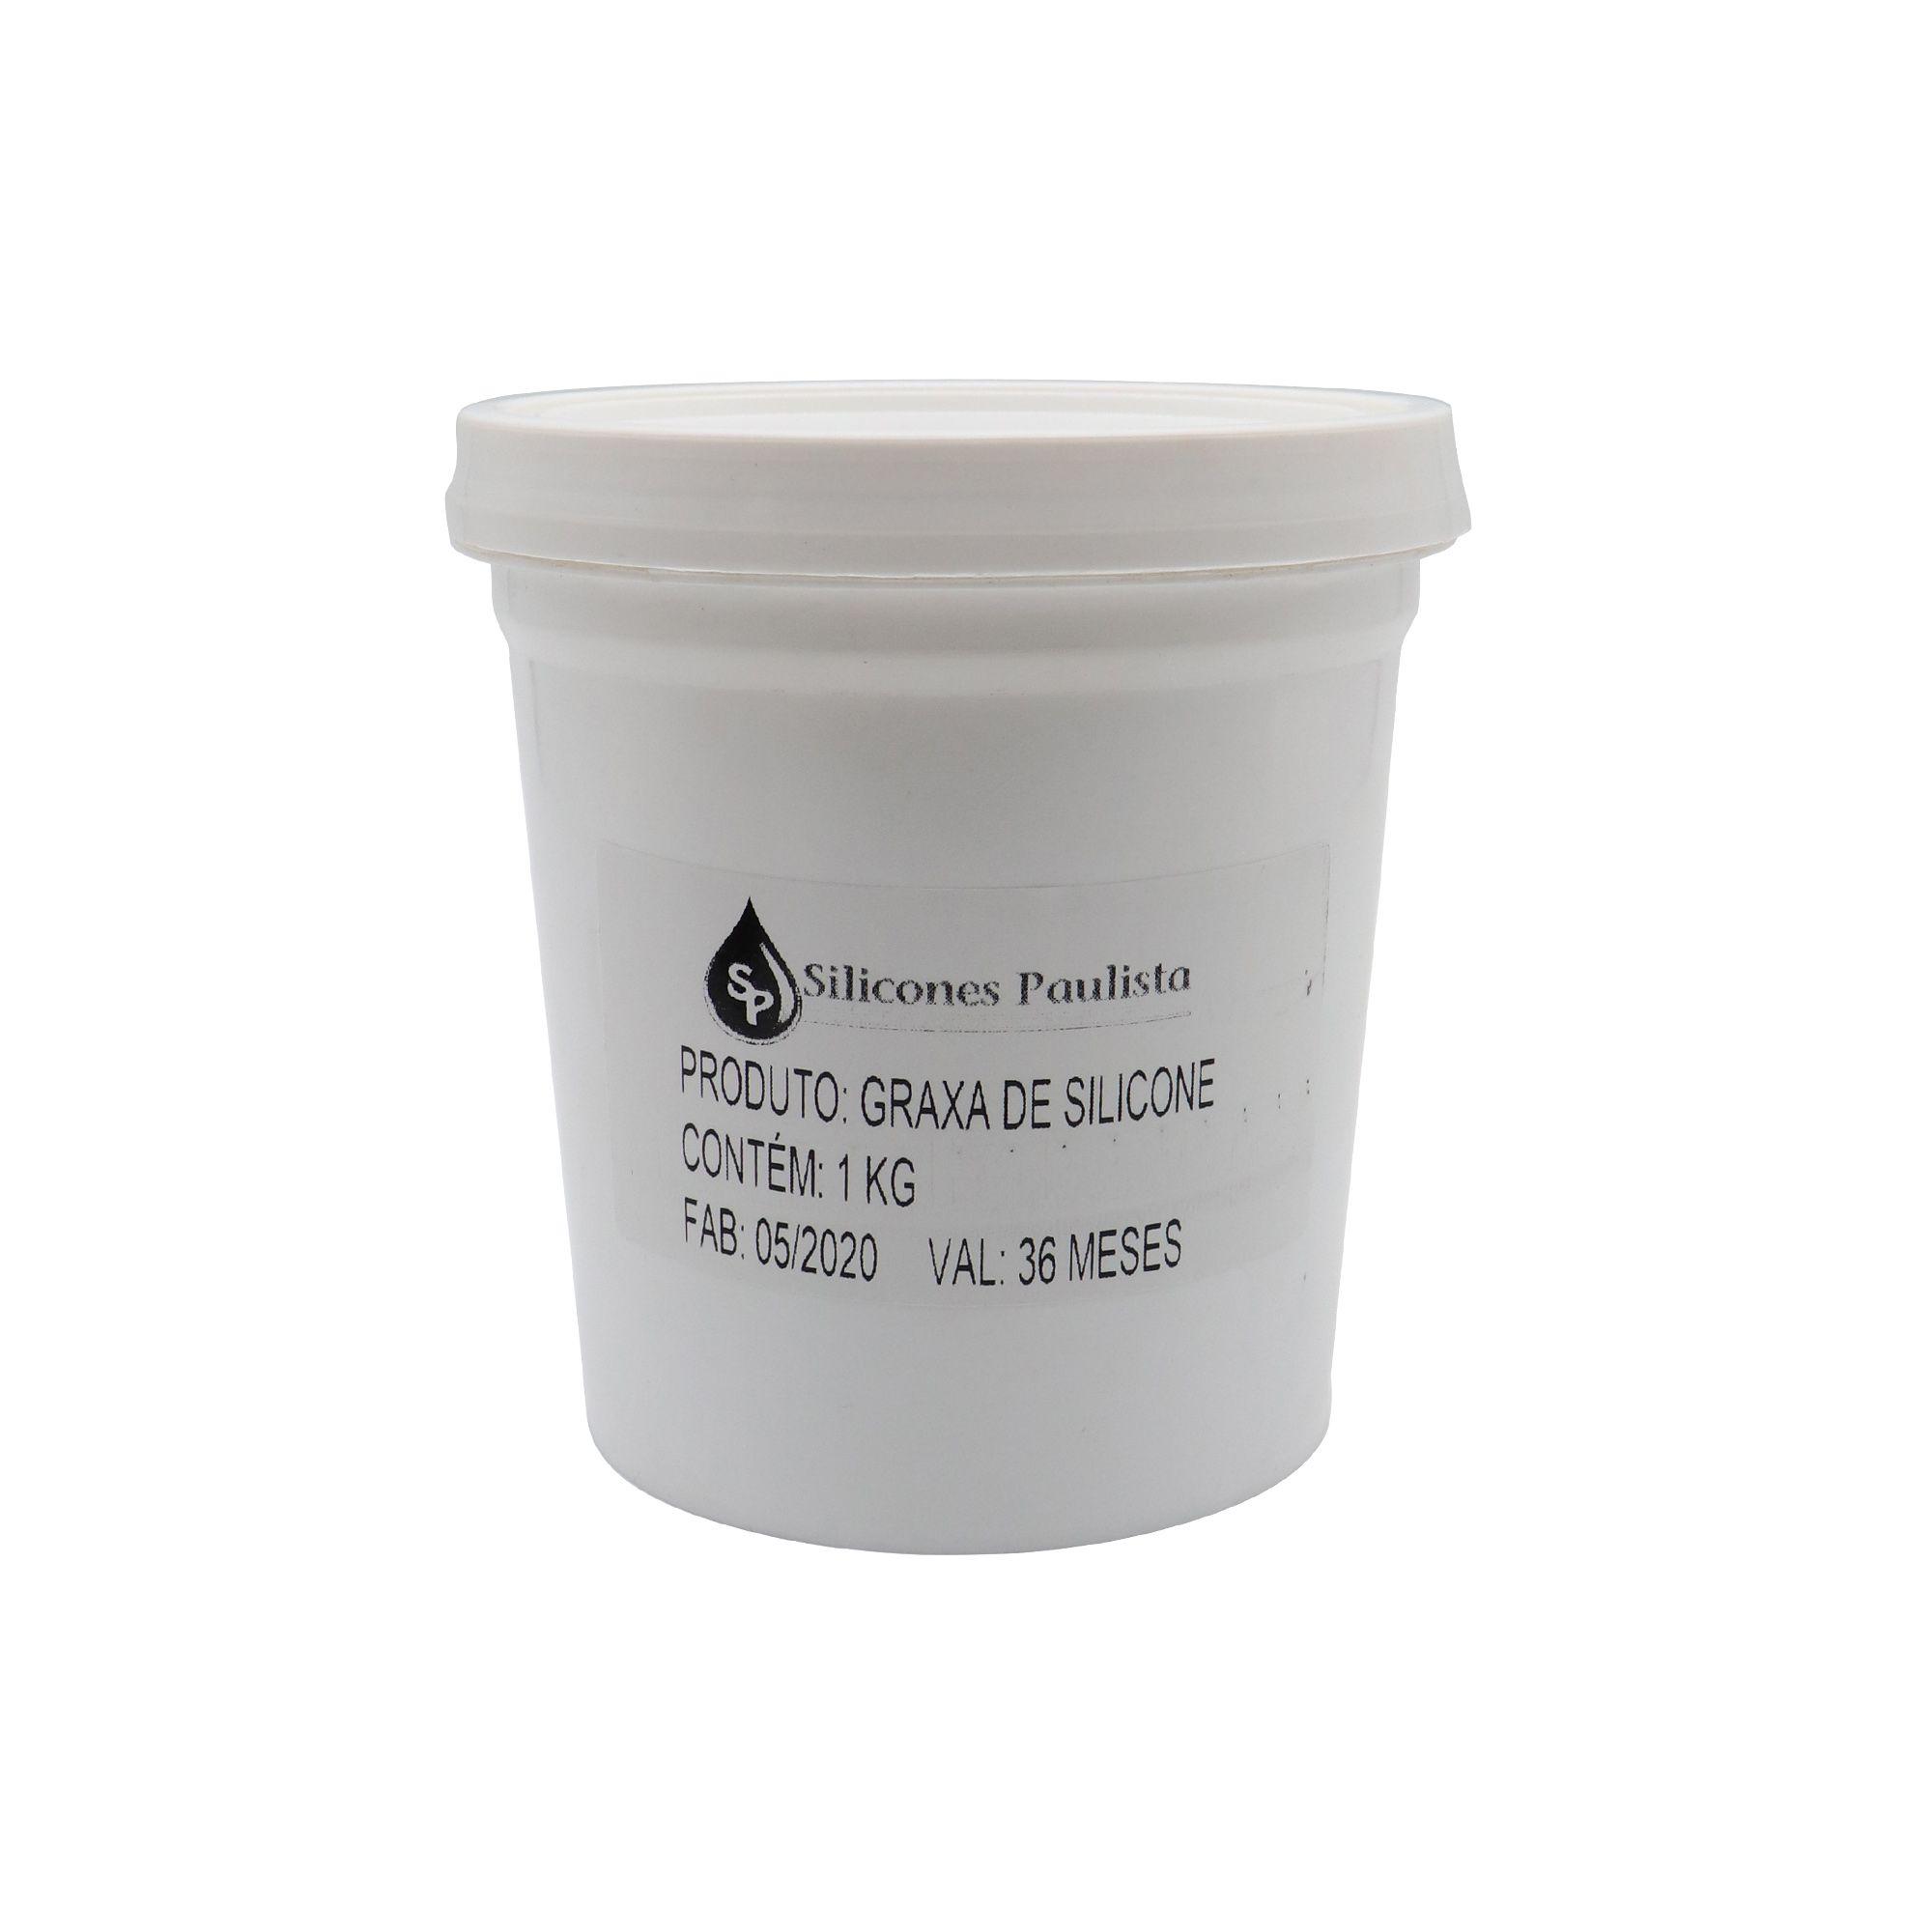 Graxa de silicone 1kg